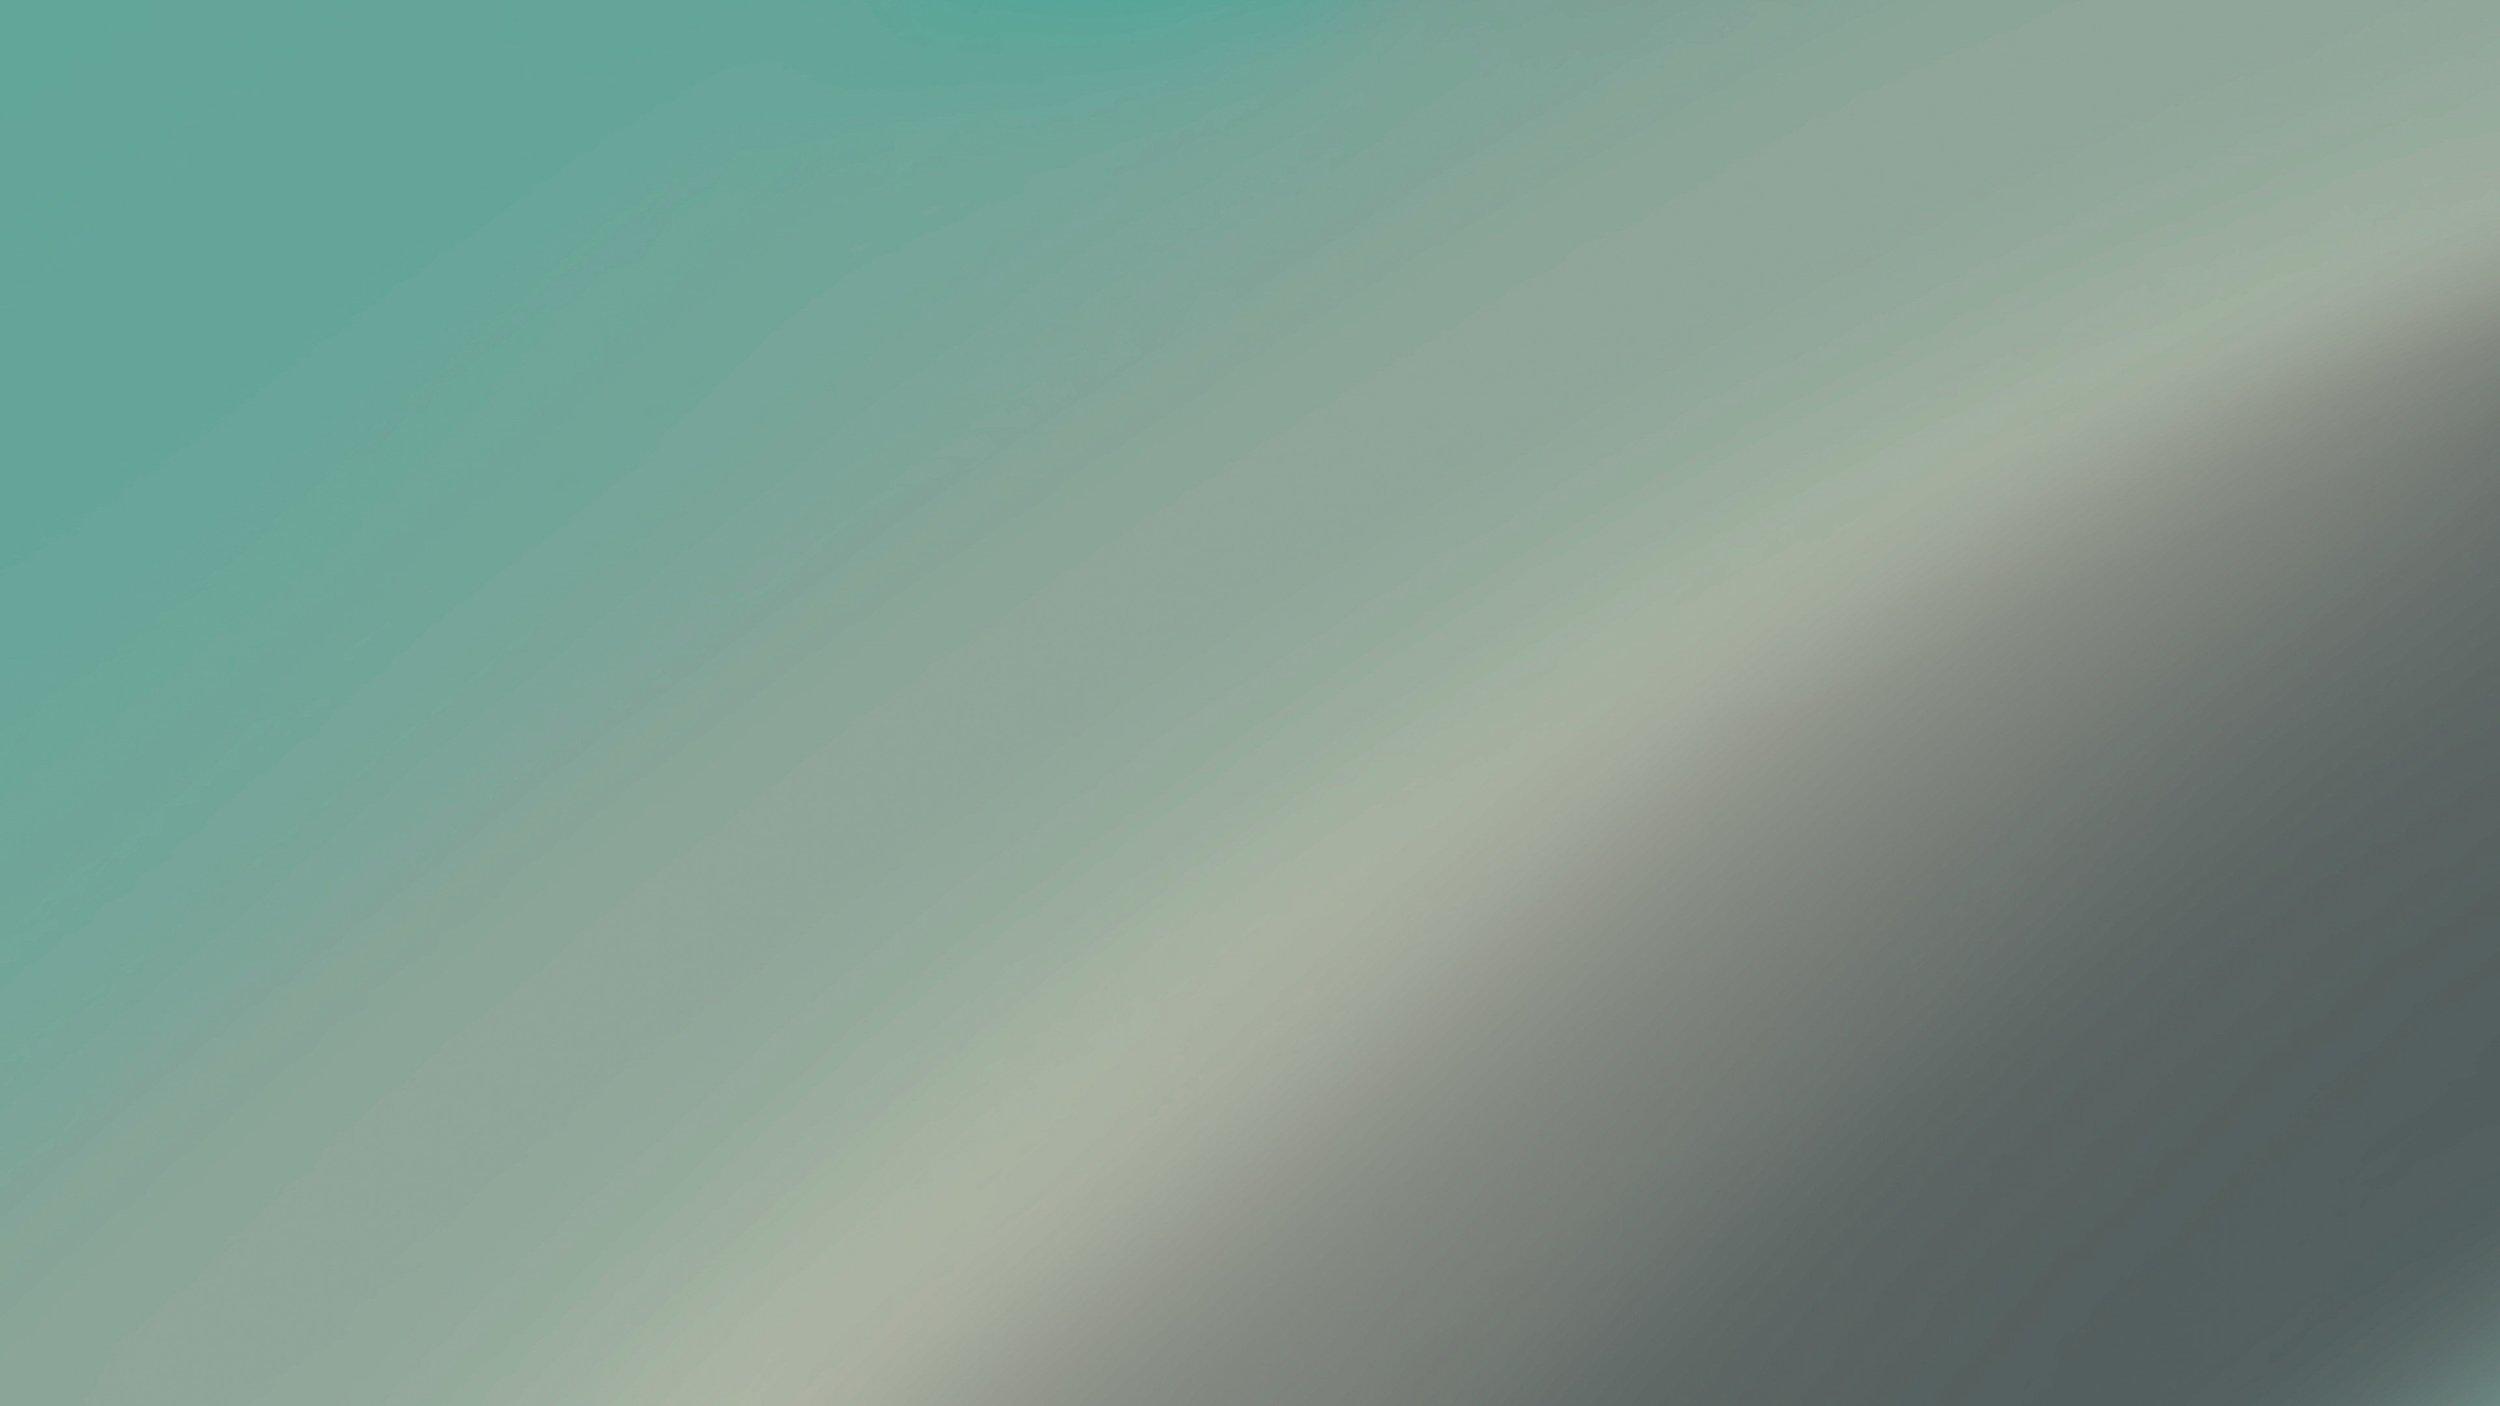 Minimal-Wallpaper-Gradient-for-Mac-Daniel-Romero-rmrdnl-2.jpg